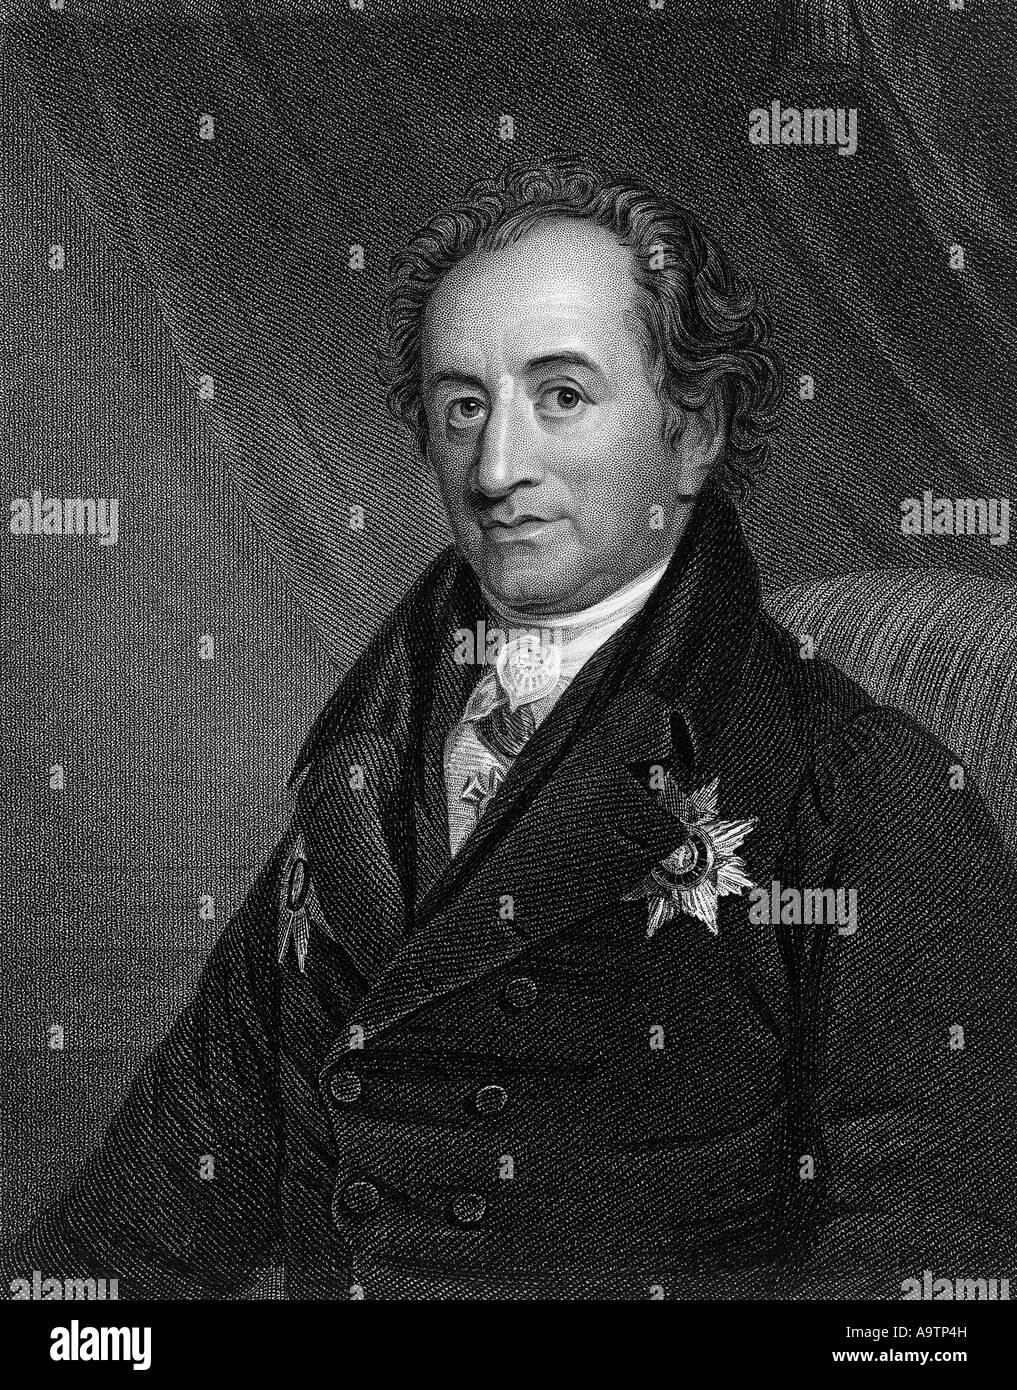 Johann Wolfgang Von Goethe 1749 1832 German Writer And